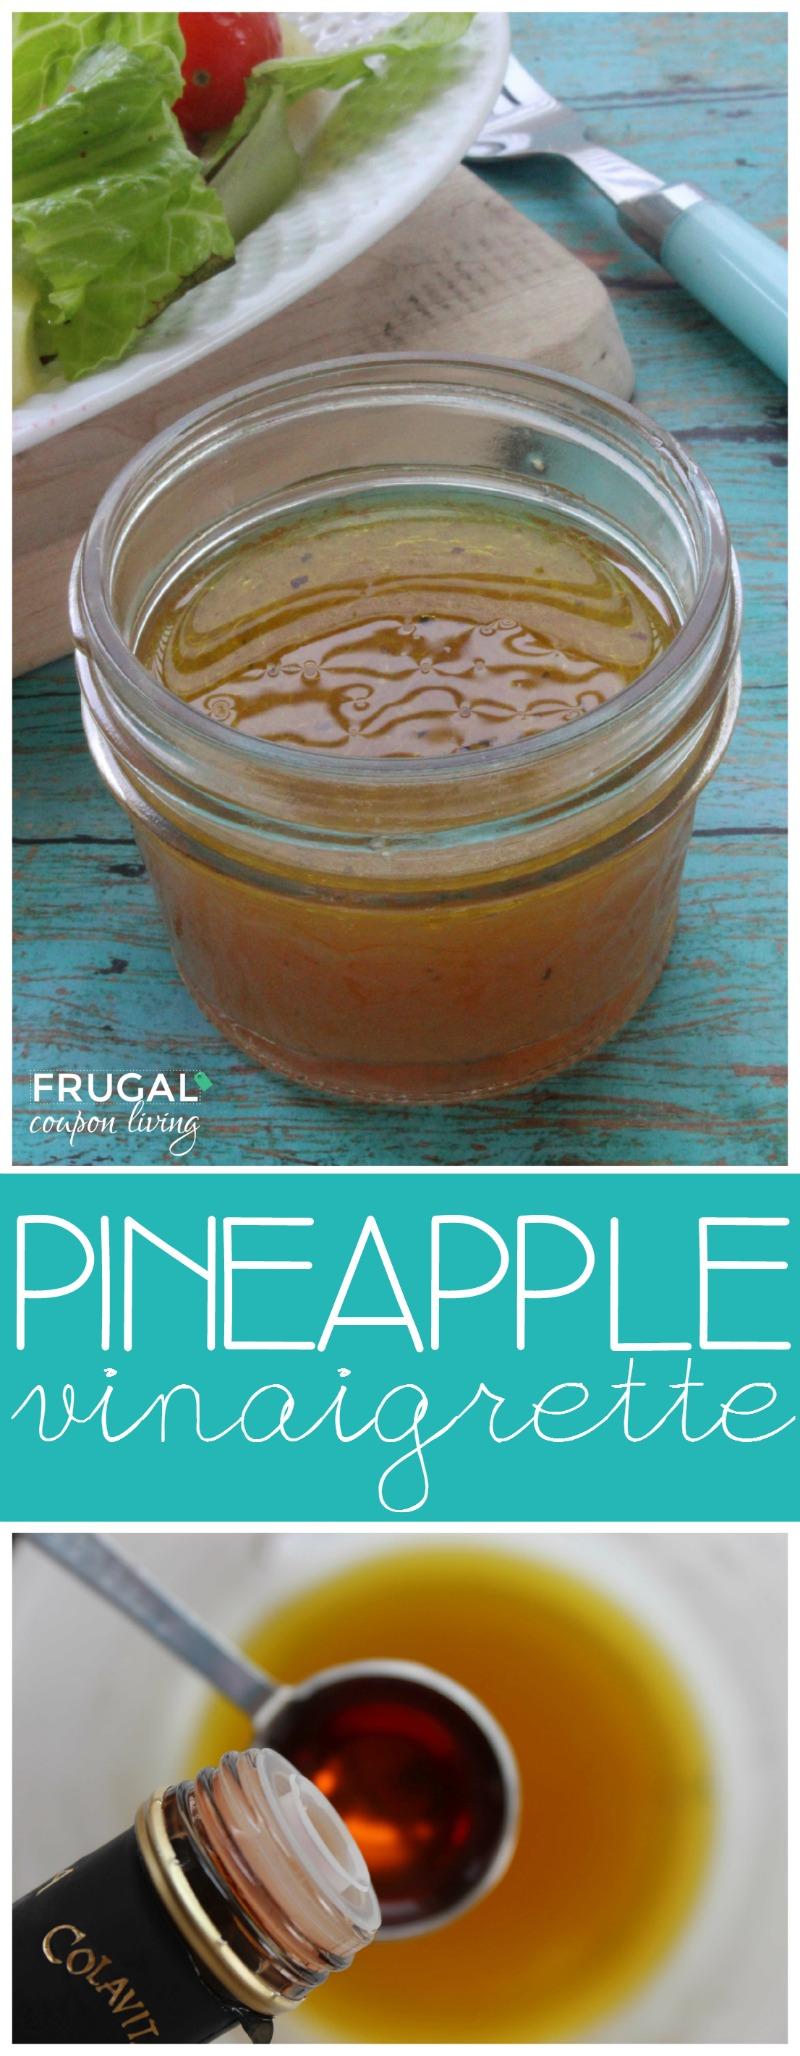 pineapple-vinaigrette-long-800-frugal-coupon-living